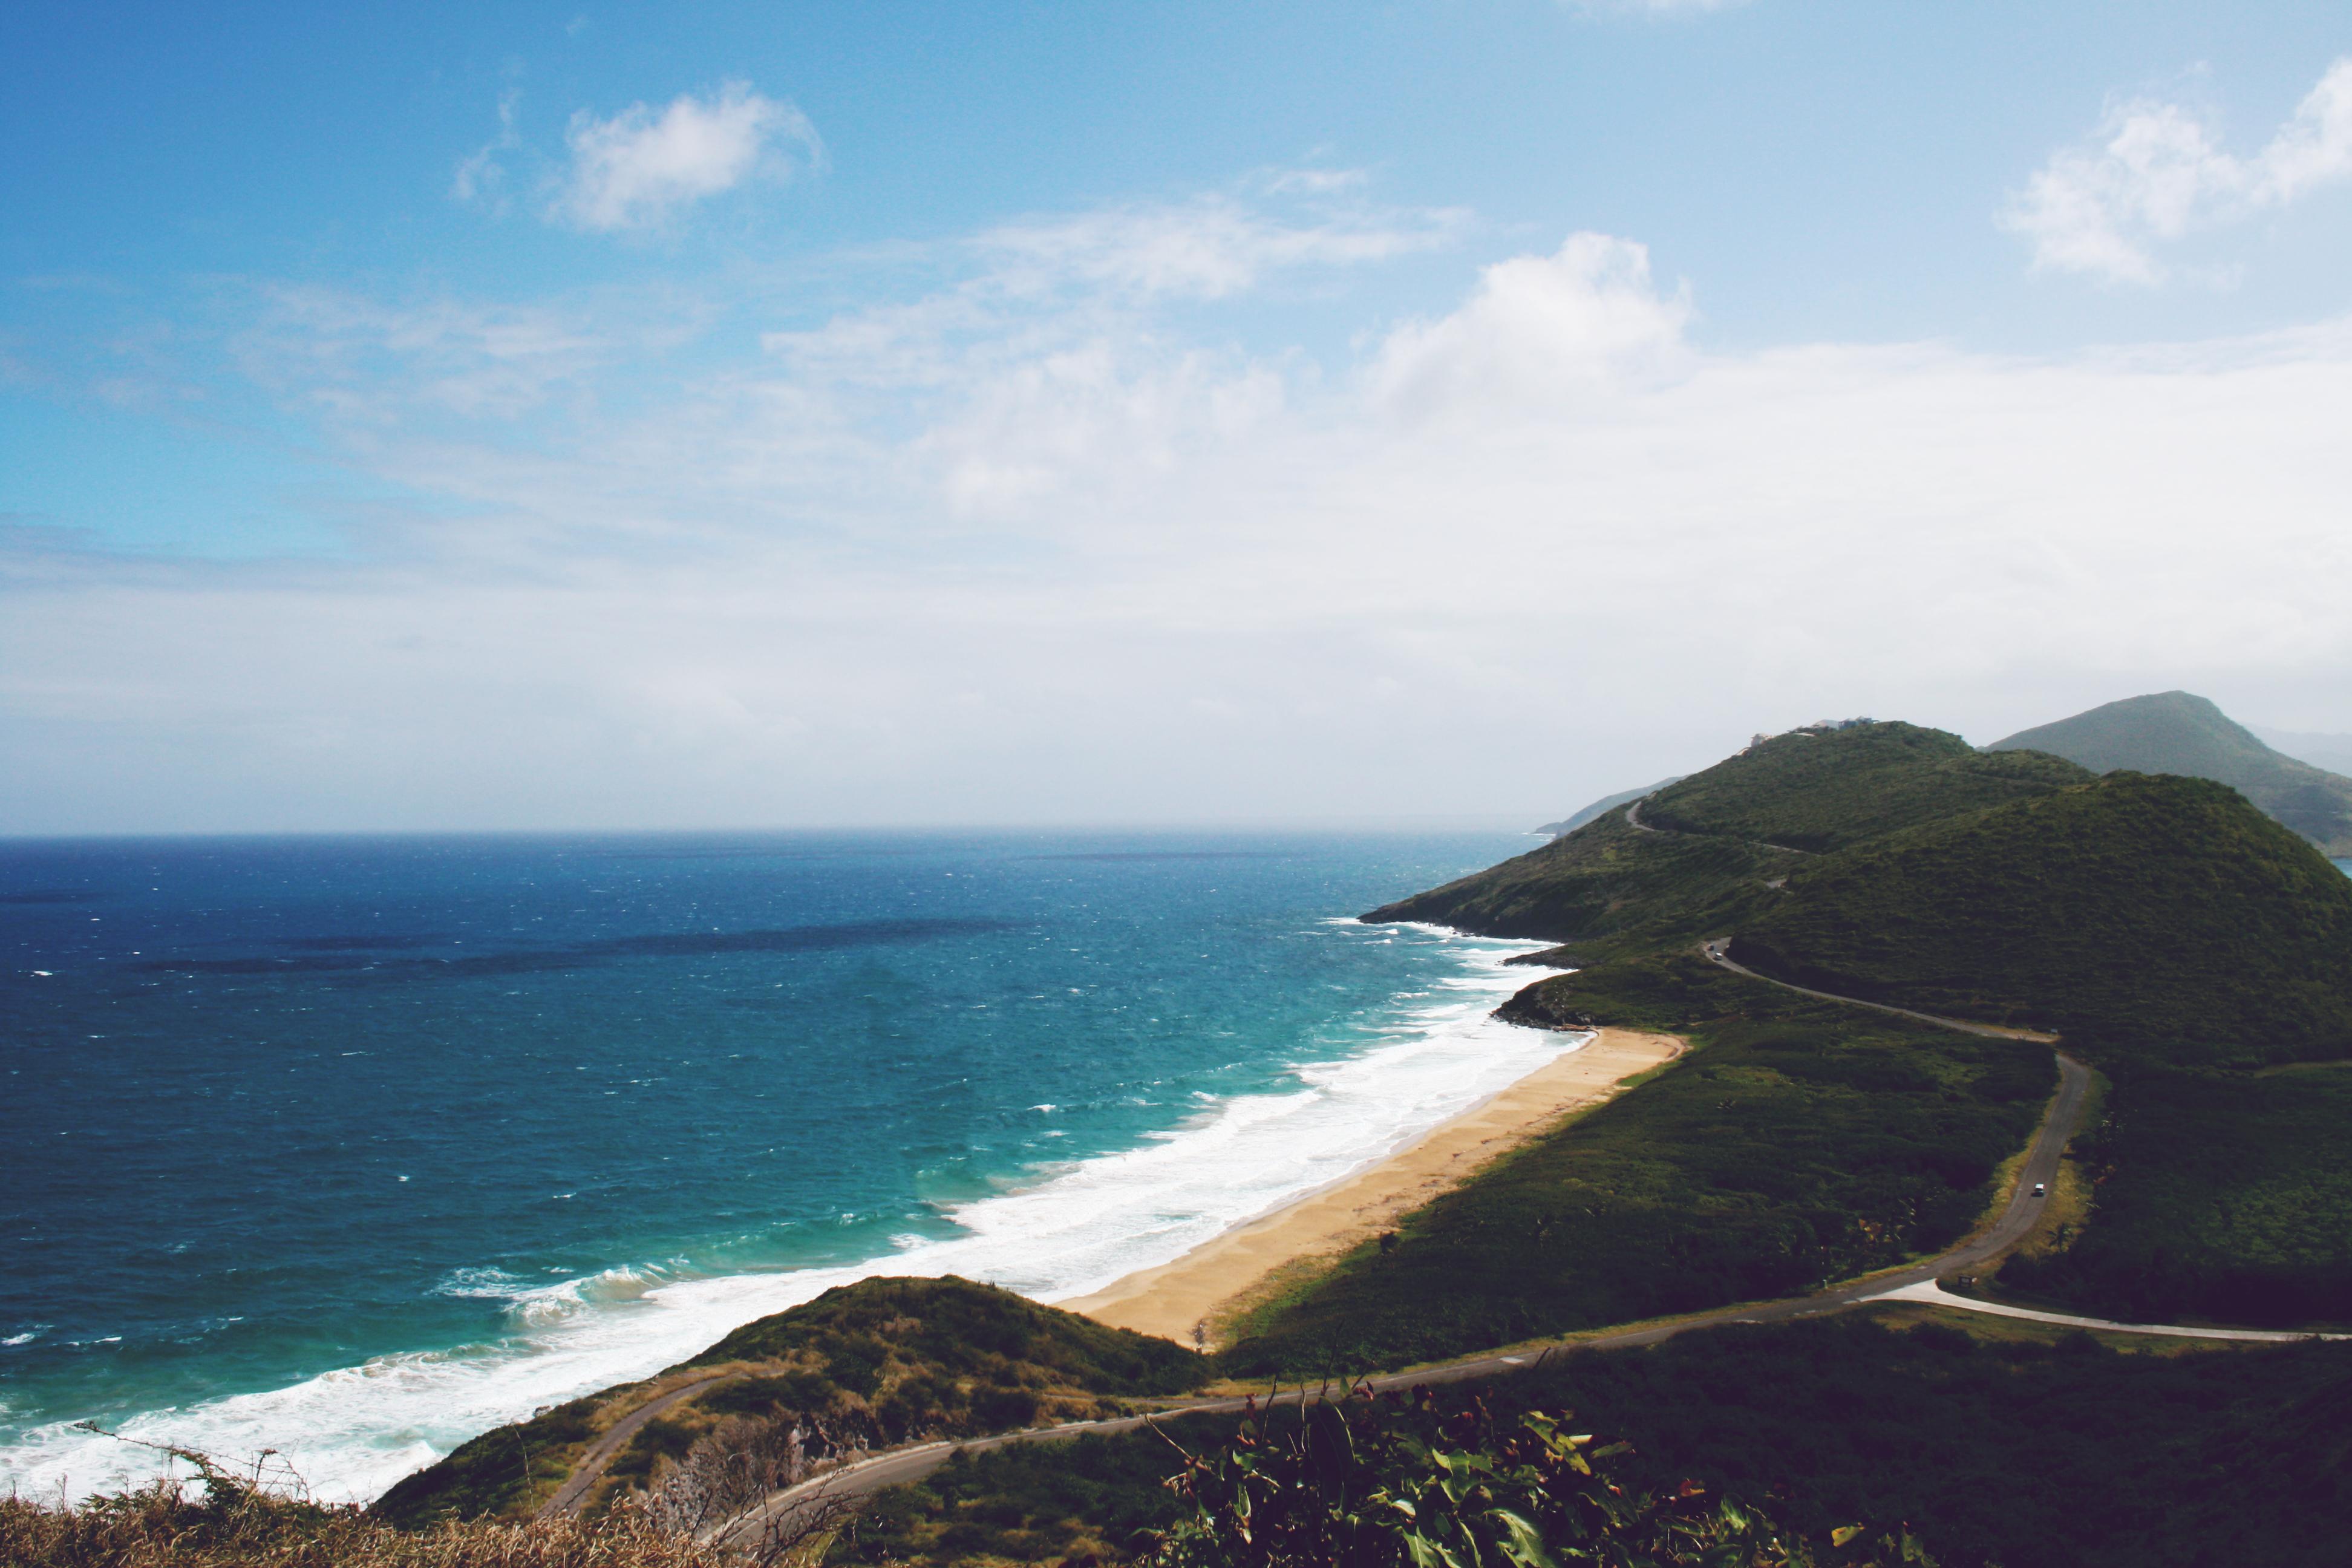 sea-landscape-mountains-nature.jpg